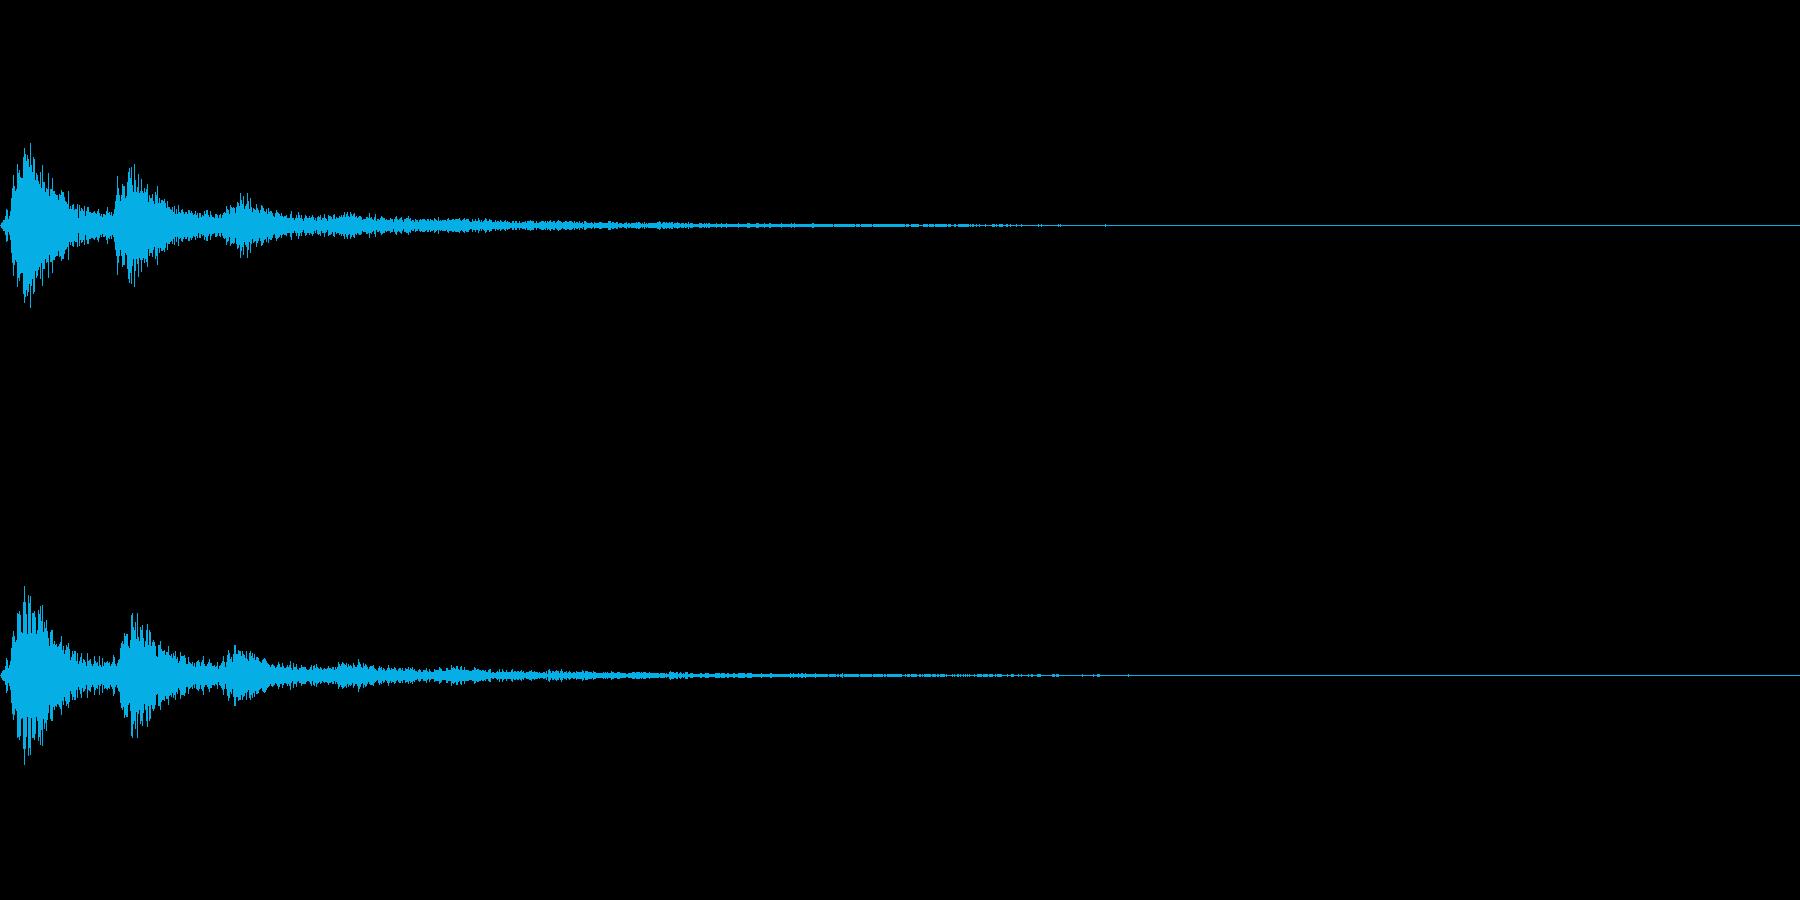 TVFX 風切り音 PR 目立たせSE2の再生済みの波形